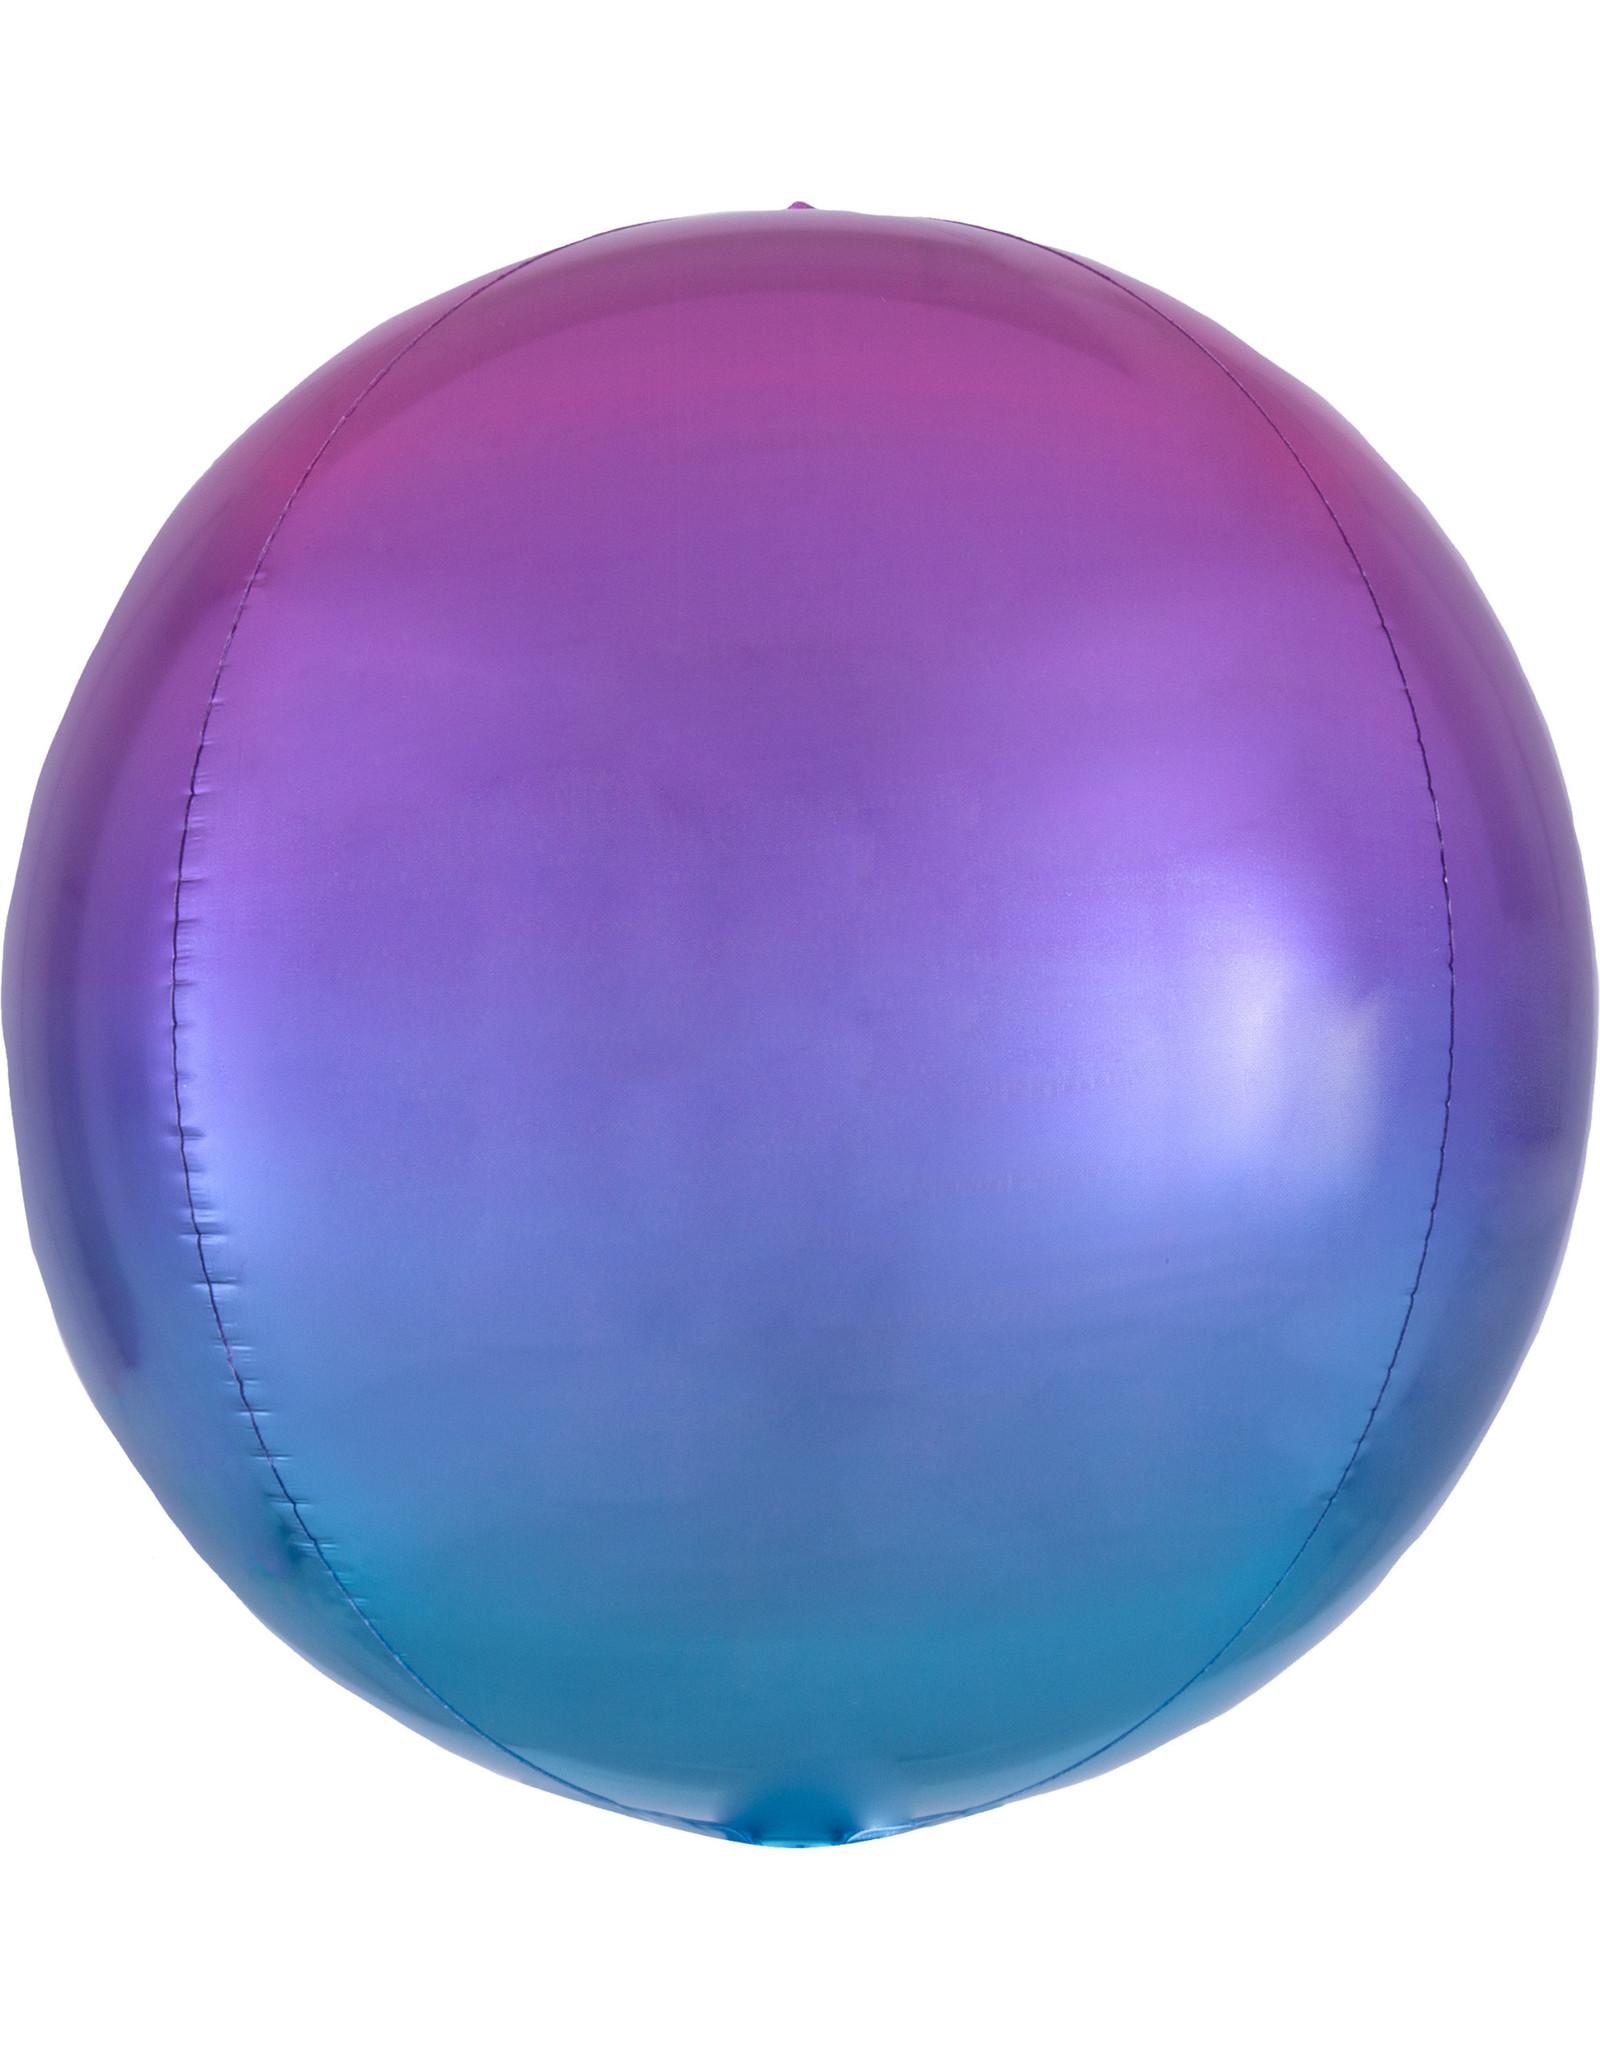 Amscan folieballon orbz roze/blauw 38 x 40 cm